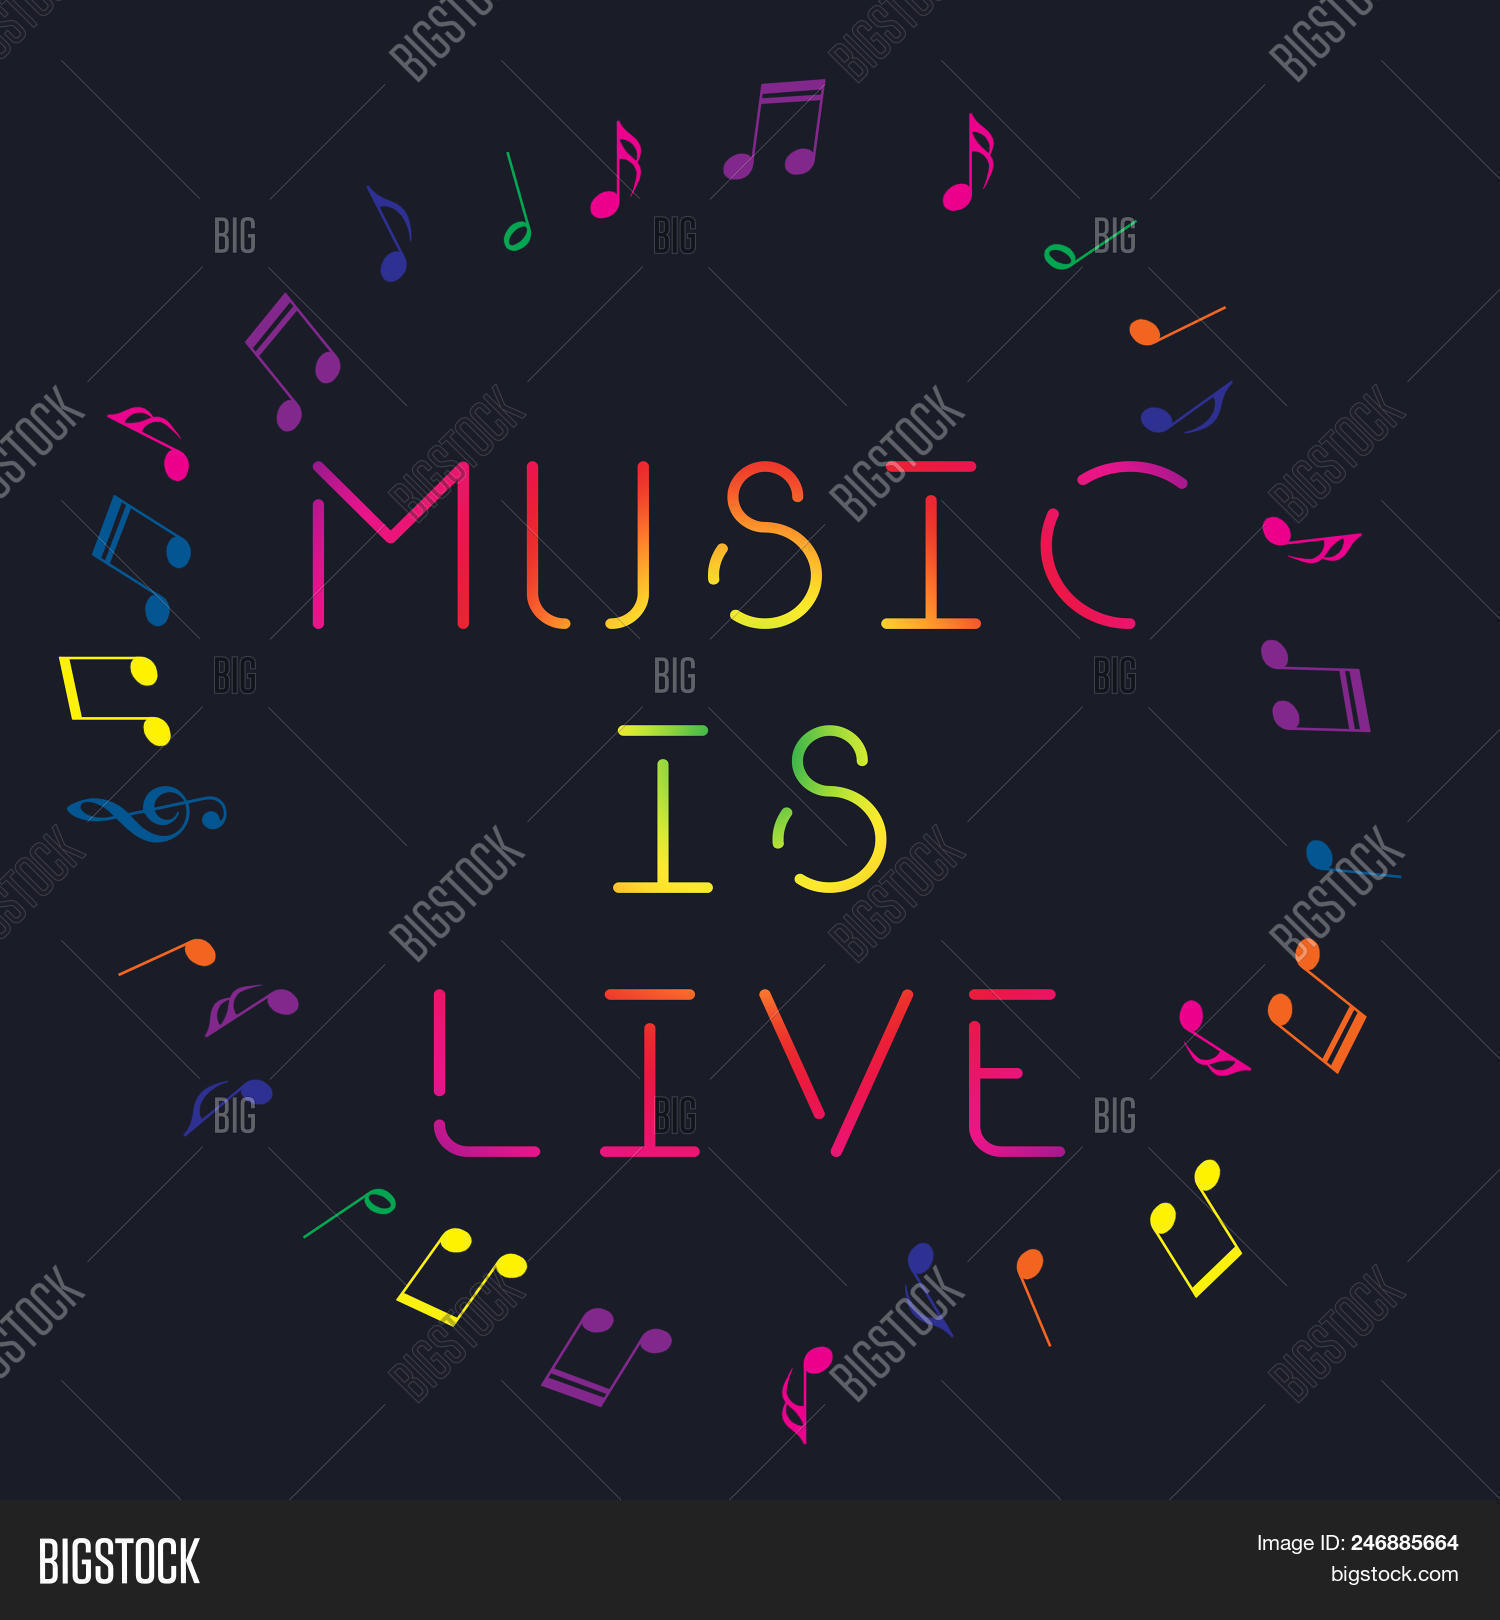 Music Art Logo. Street Image & Photo (Free Trial) | Bigstock